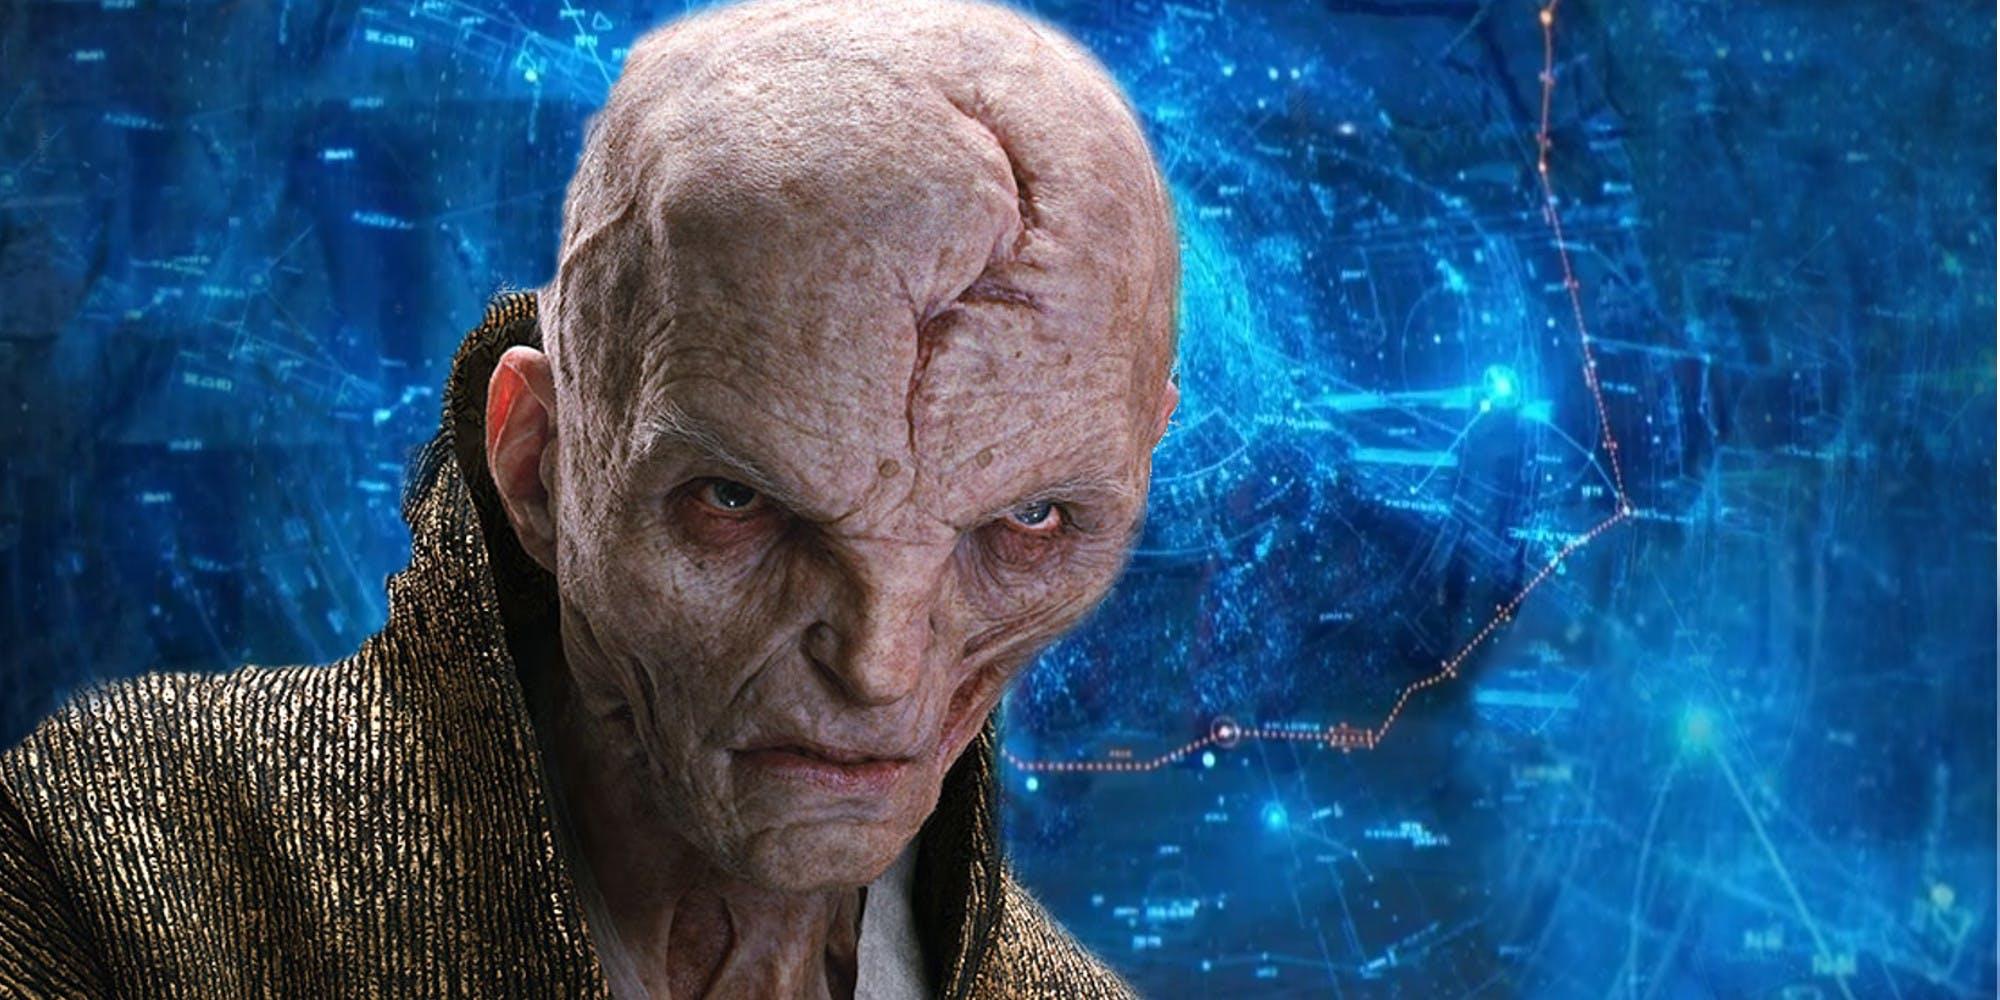 Snoke Theory: Star Wars The Last Jedi